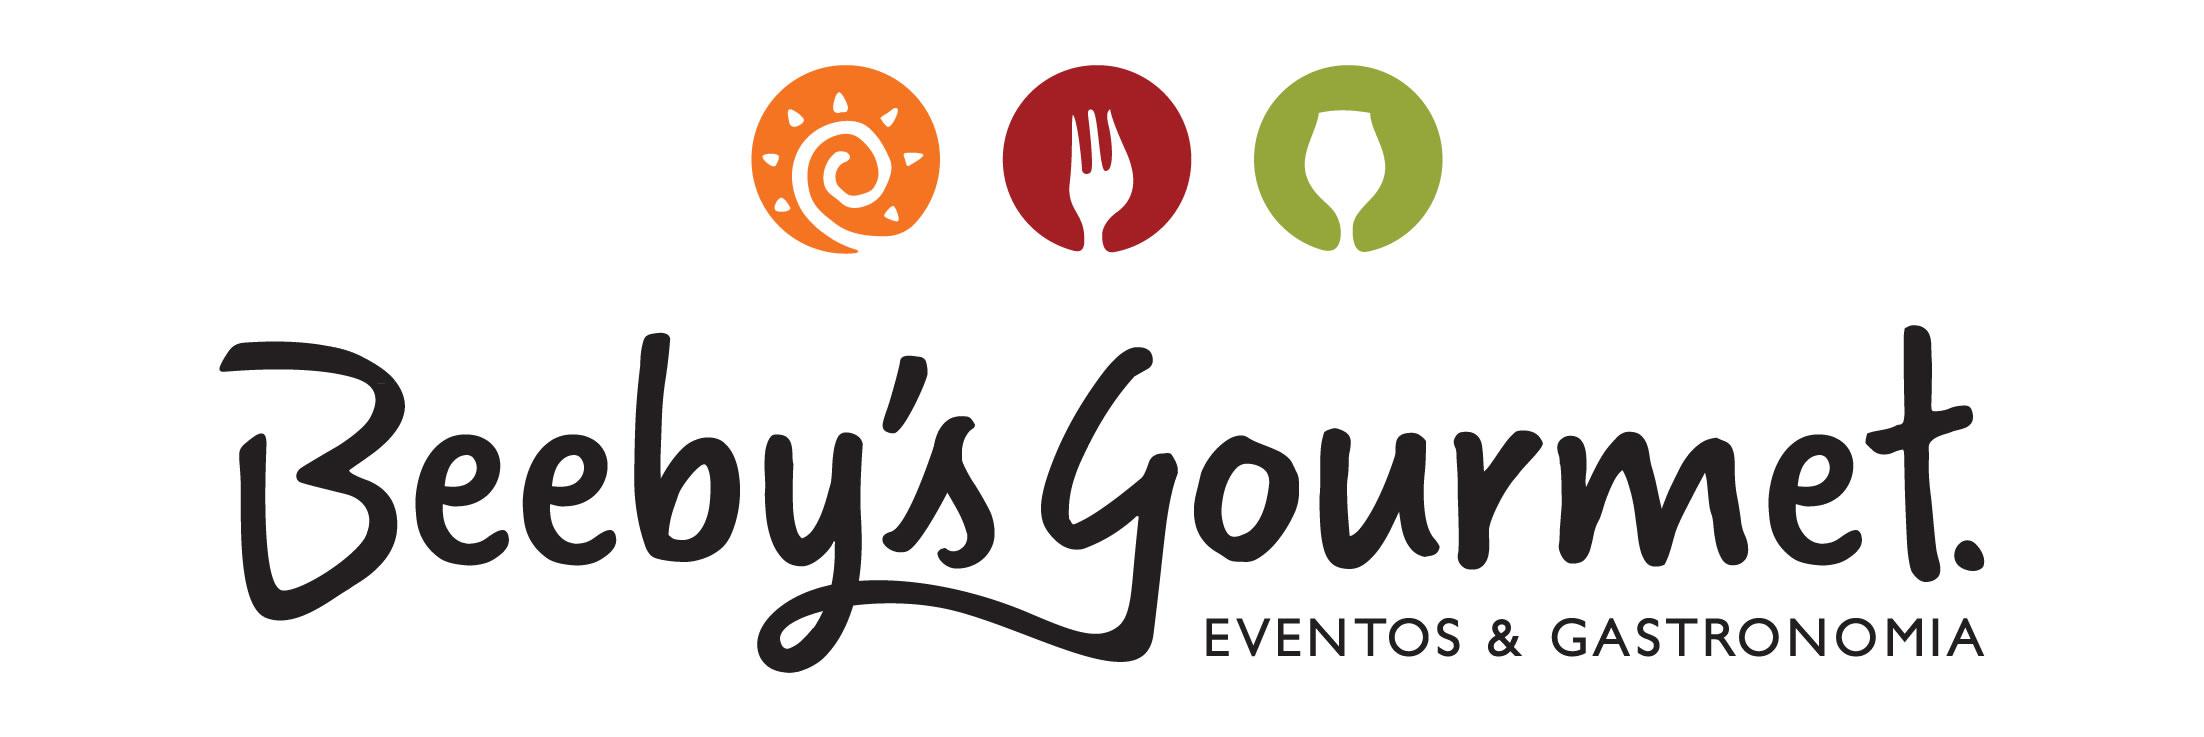 Die Meister Stube Restaurante - Beebys Gourmet - Logo.jpg